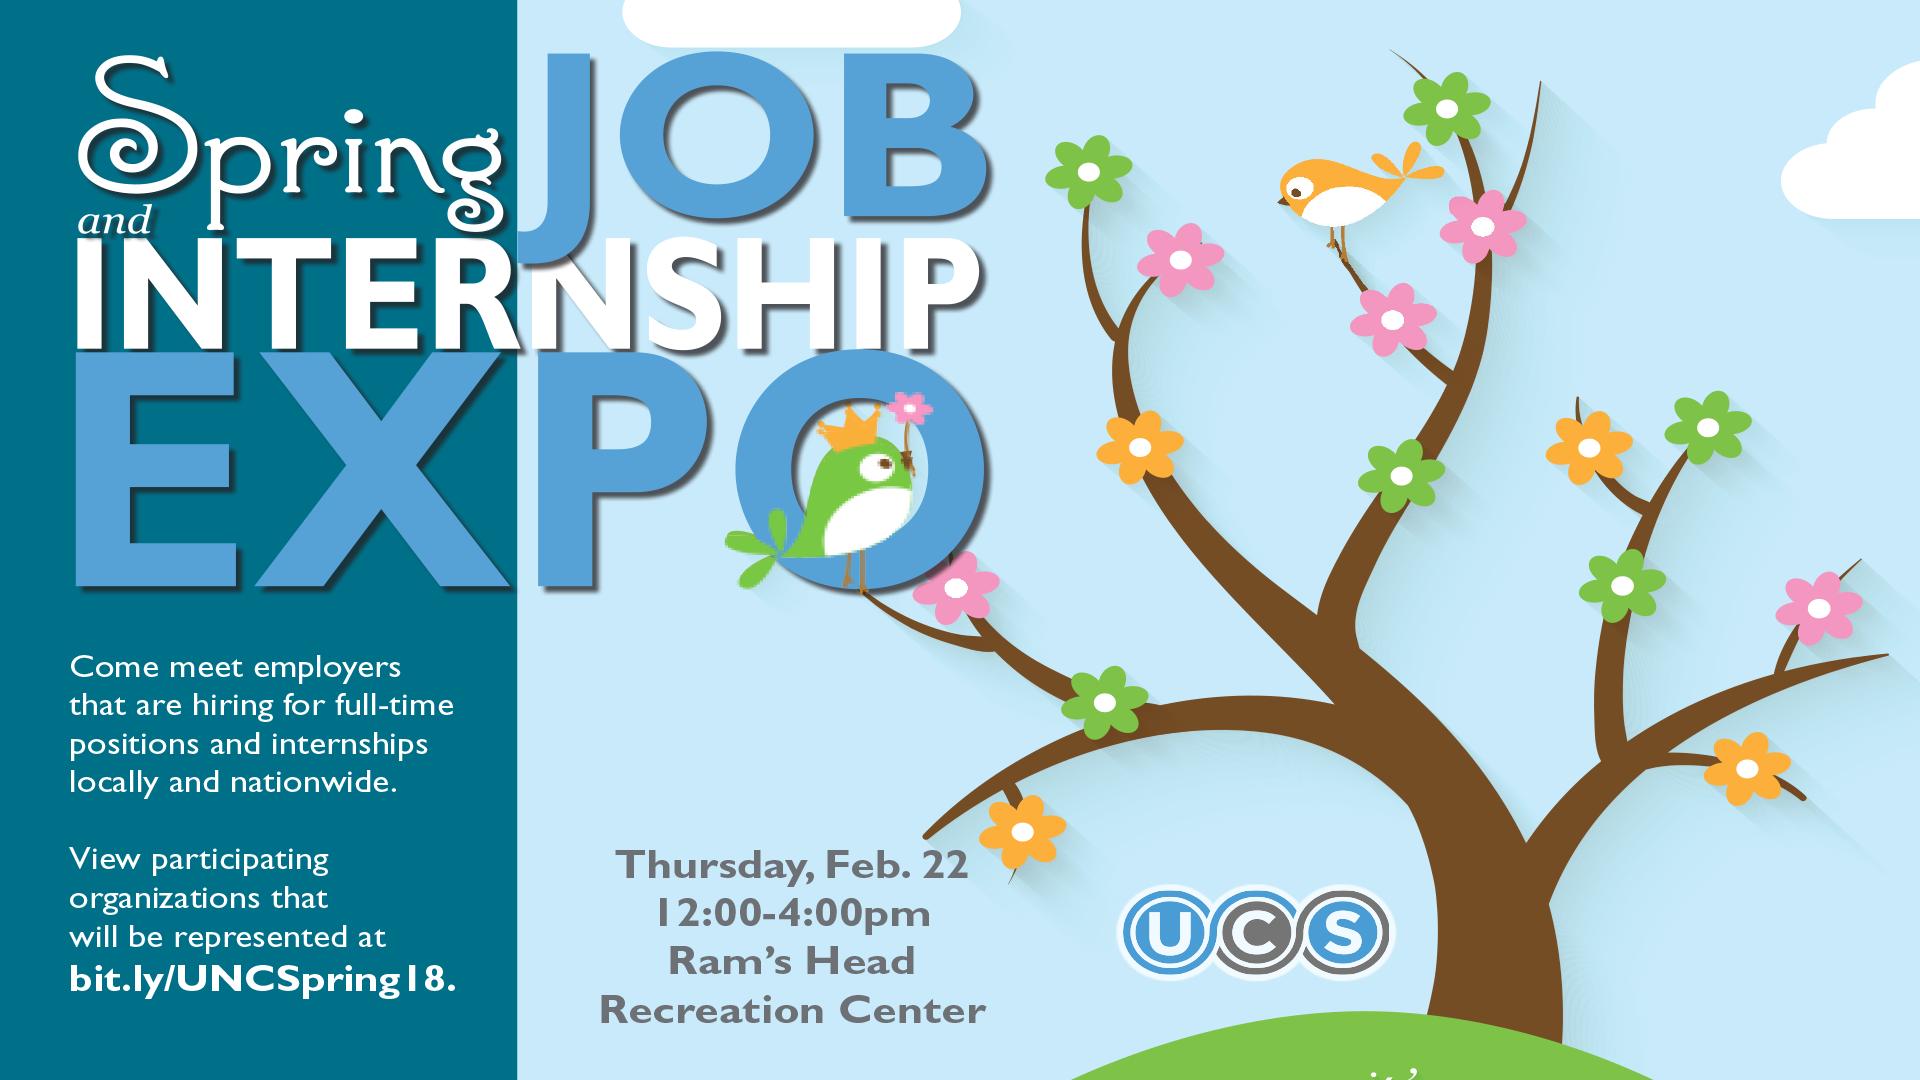 Spring Job & Internship Expo